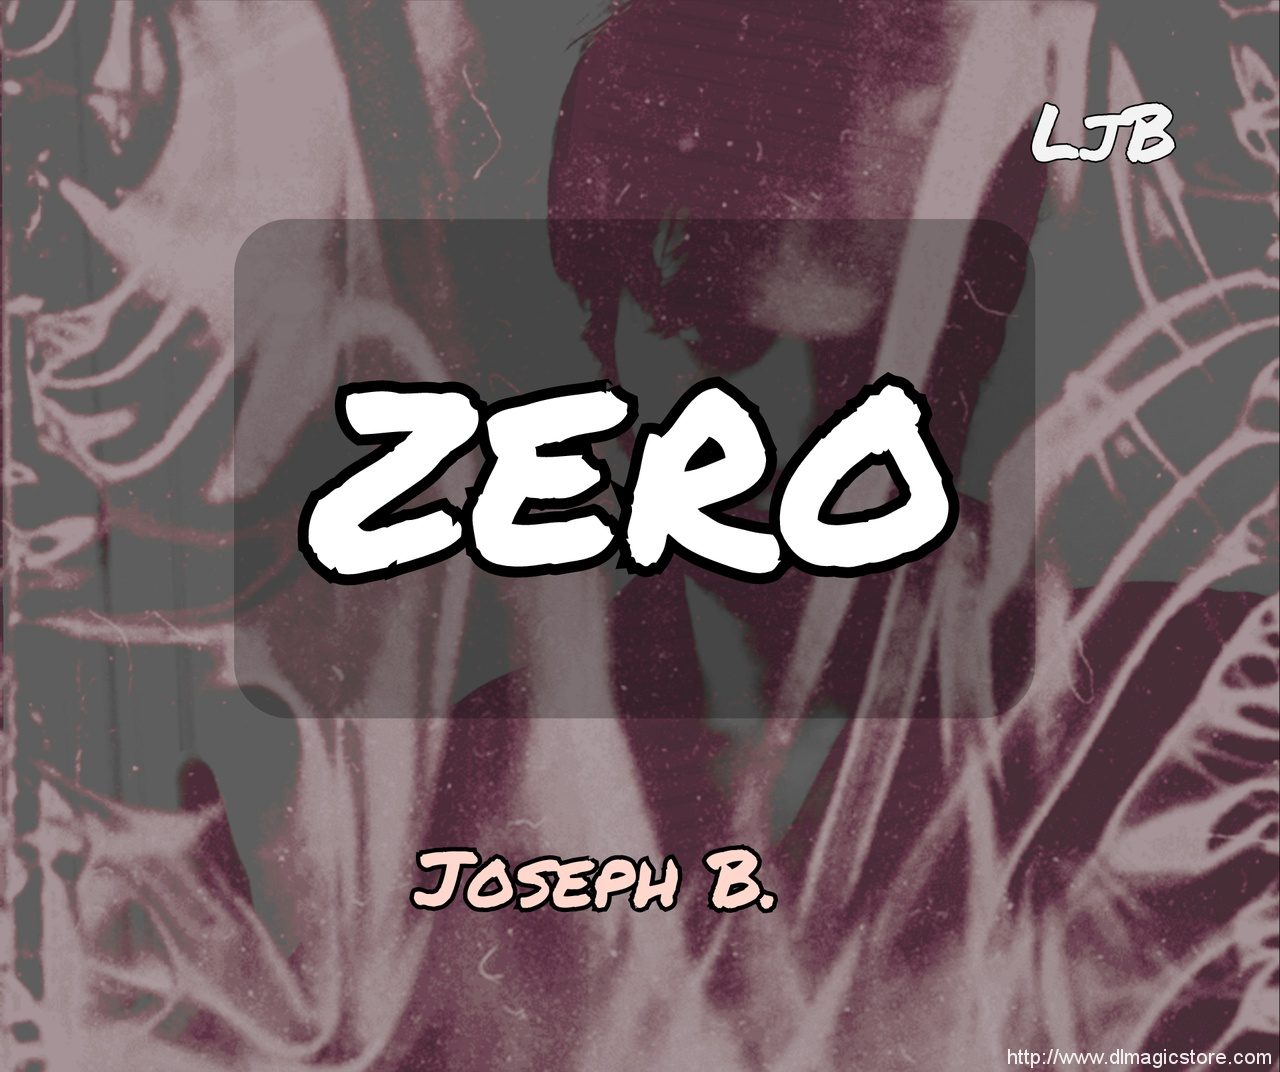 ZERO by Joseph B (Instant Download)